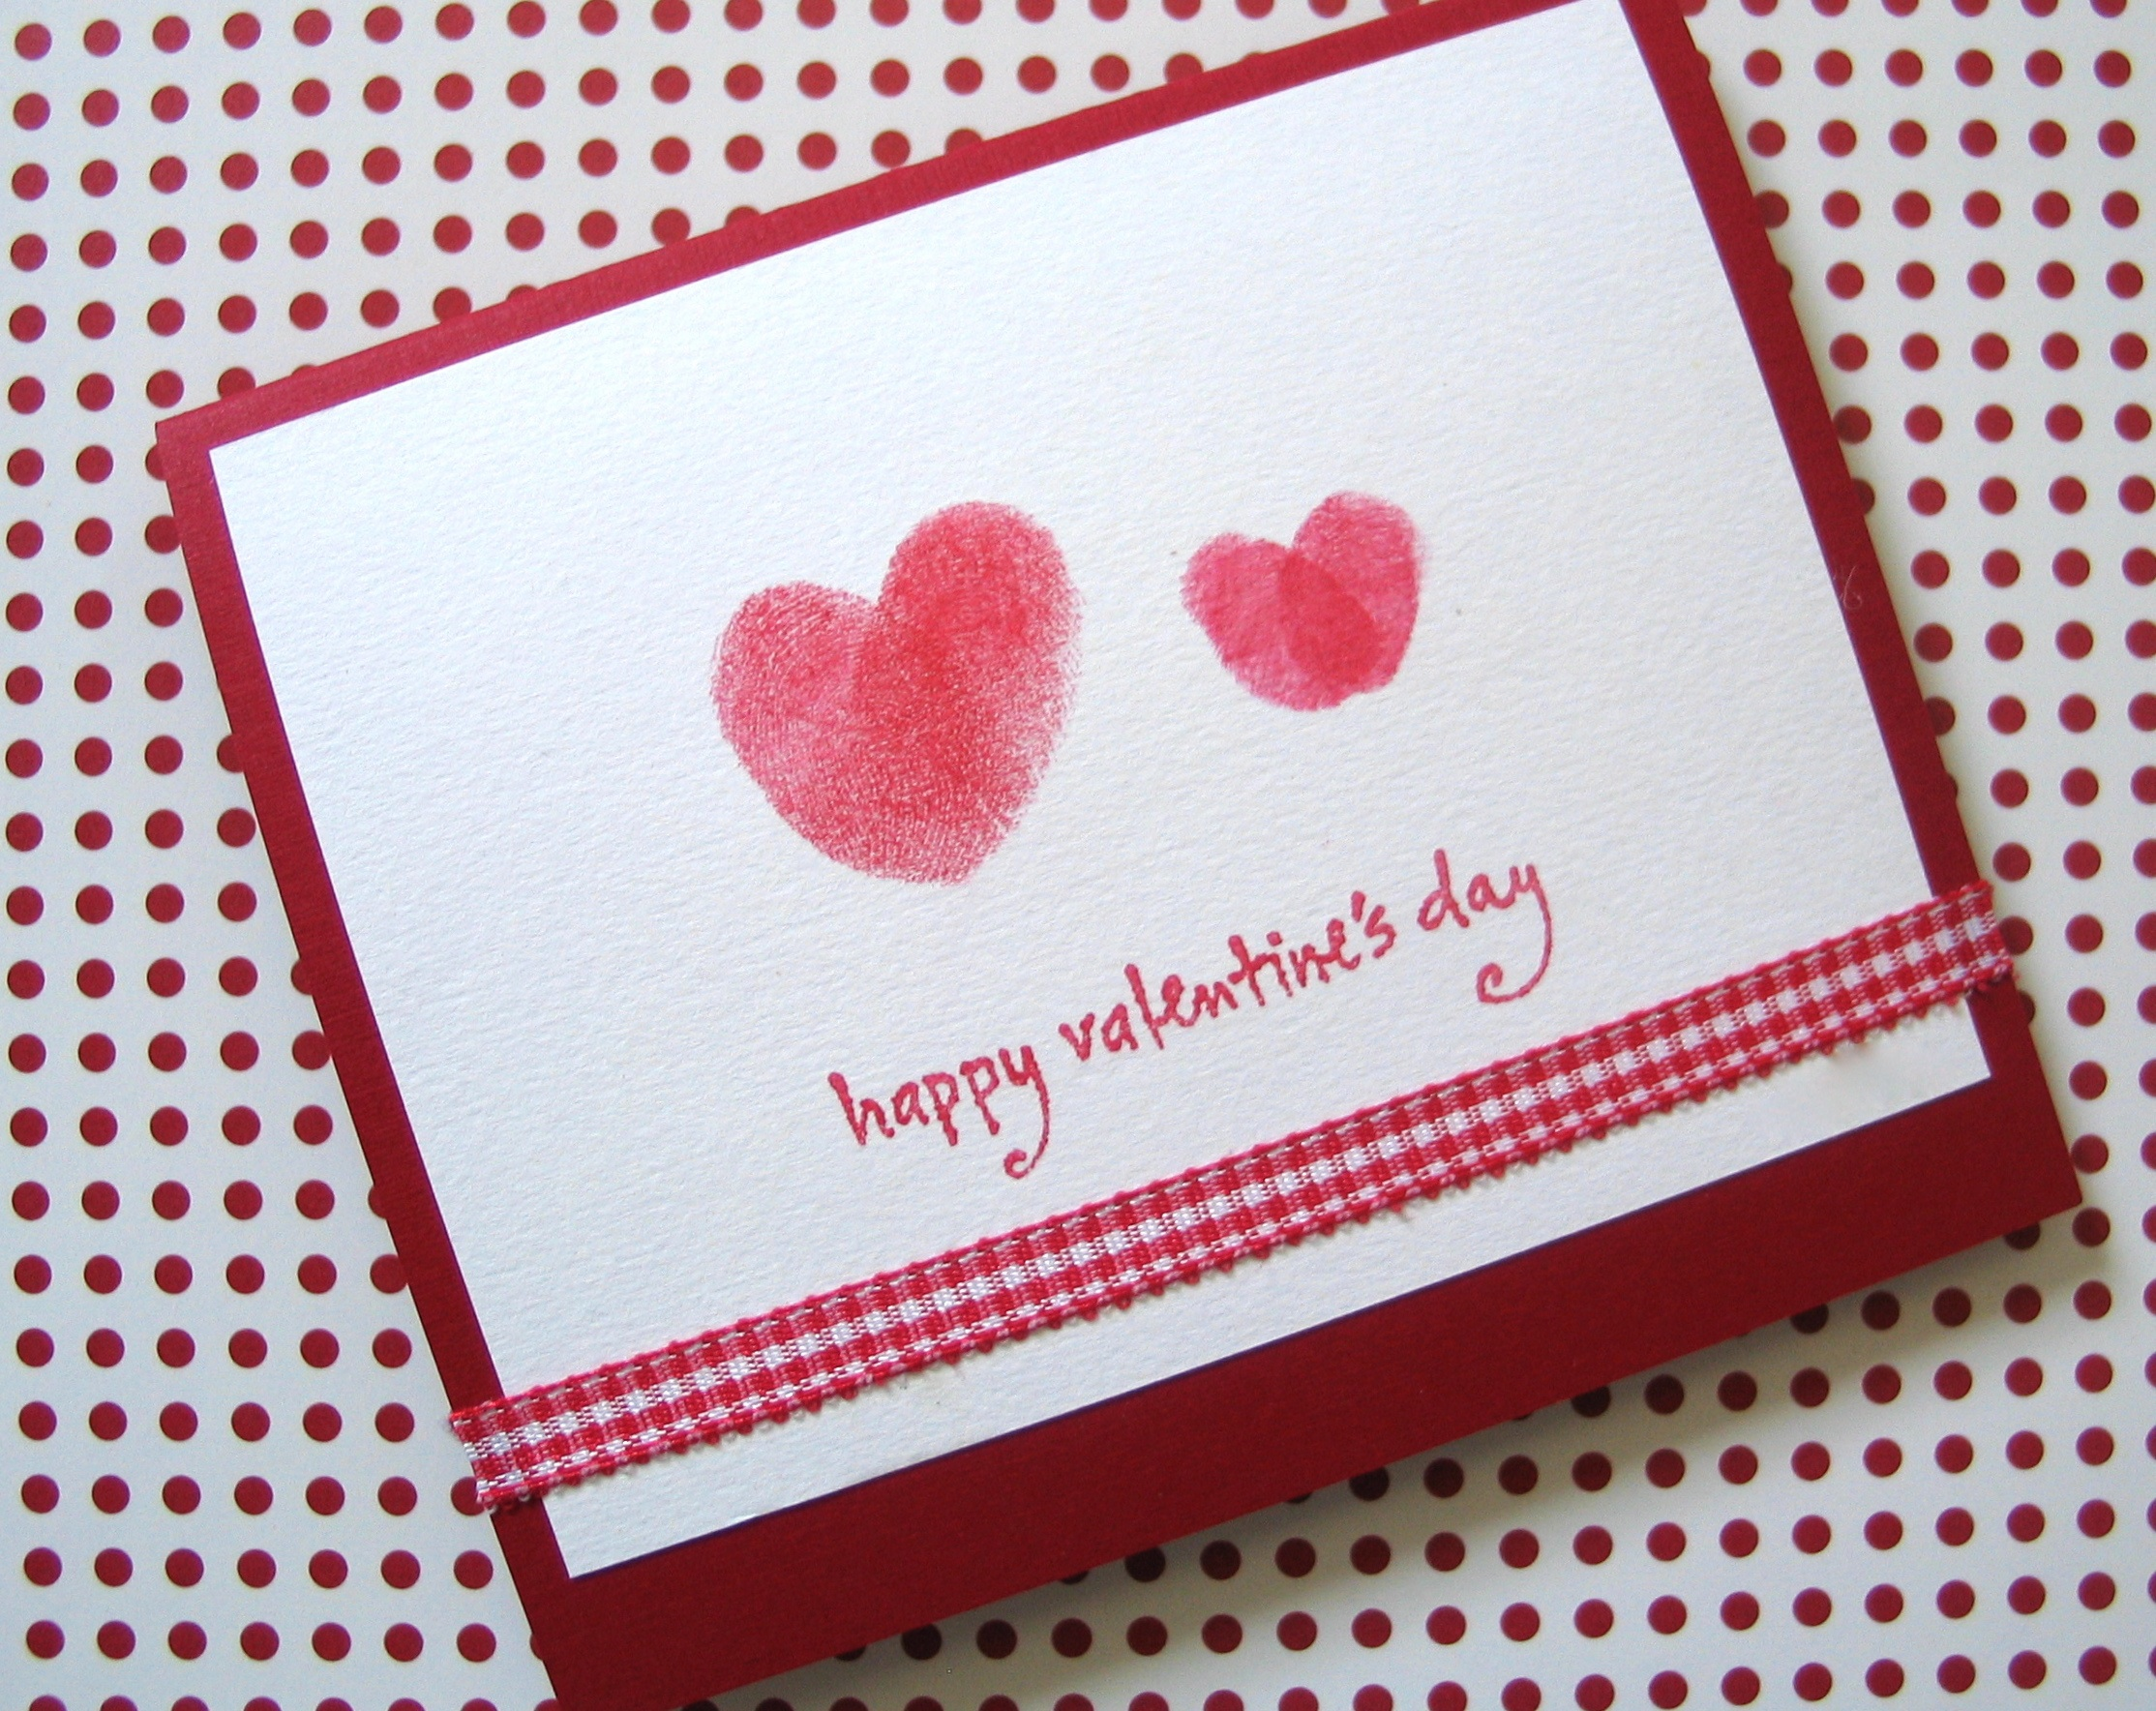 homemade-valentines-day-card-pinterest